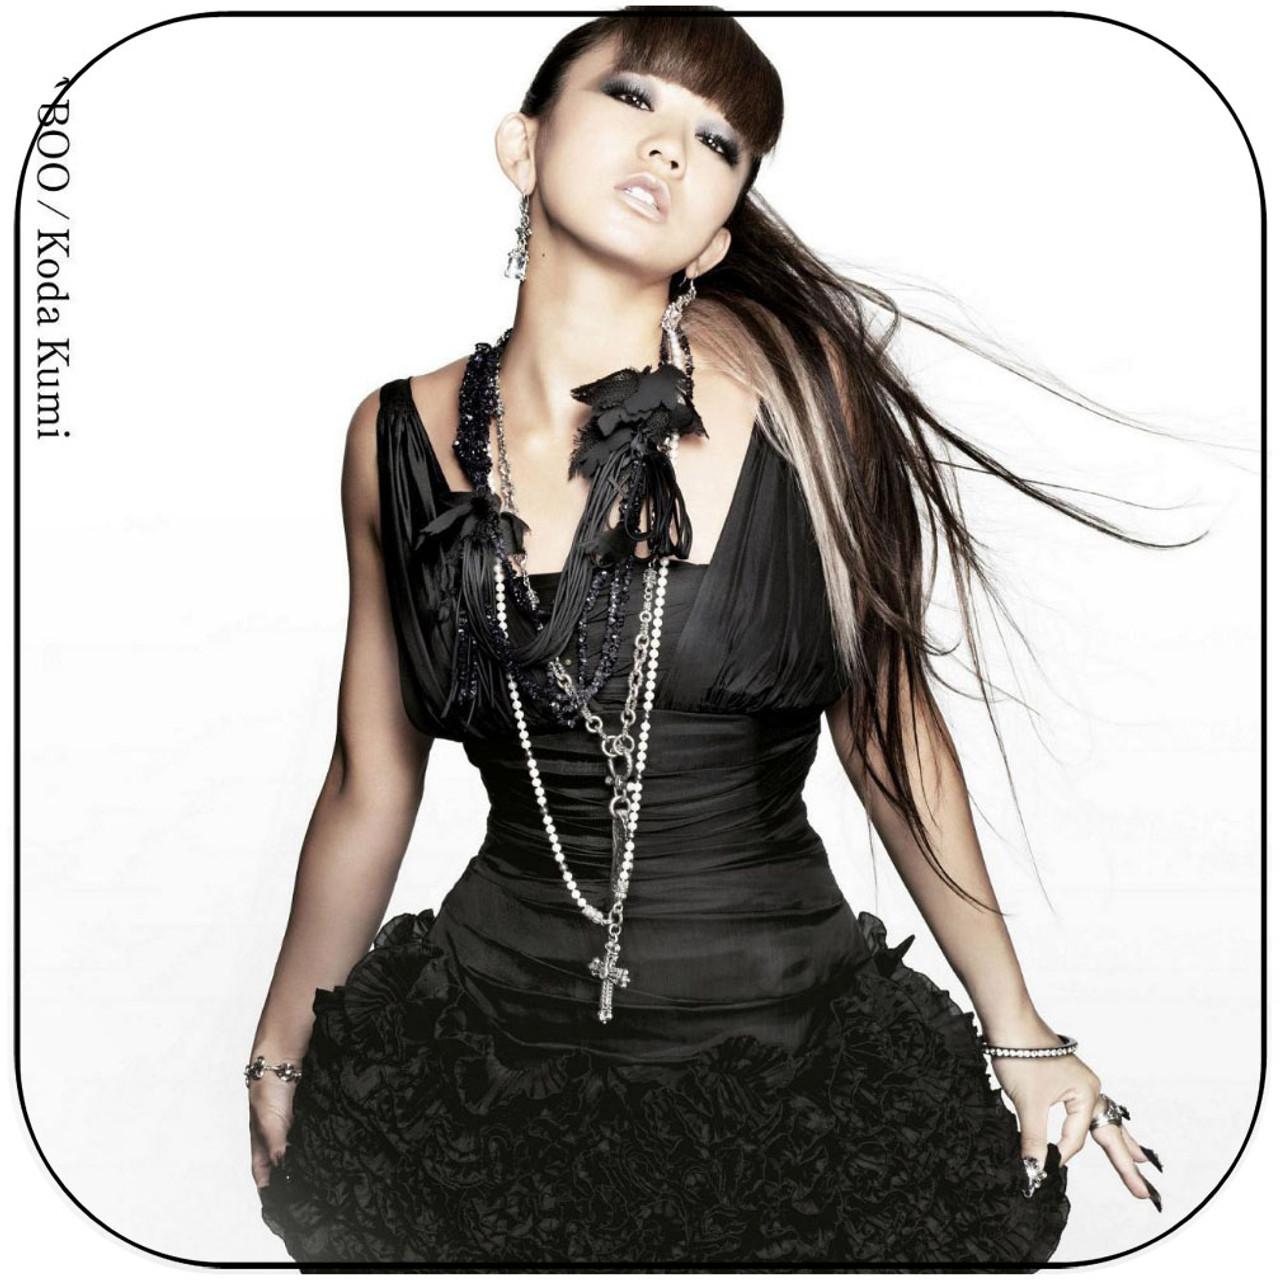 Kumi Koda Taboo 2 Album Cover Sticker Дороти ле мэй, хони уайлдер, кевин джеймс и др. kumi koda taboo 2 album cover sticker